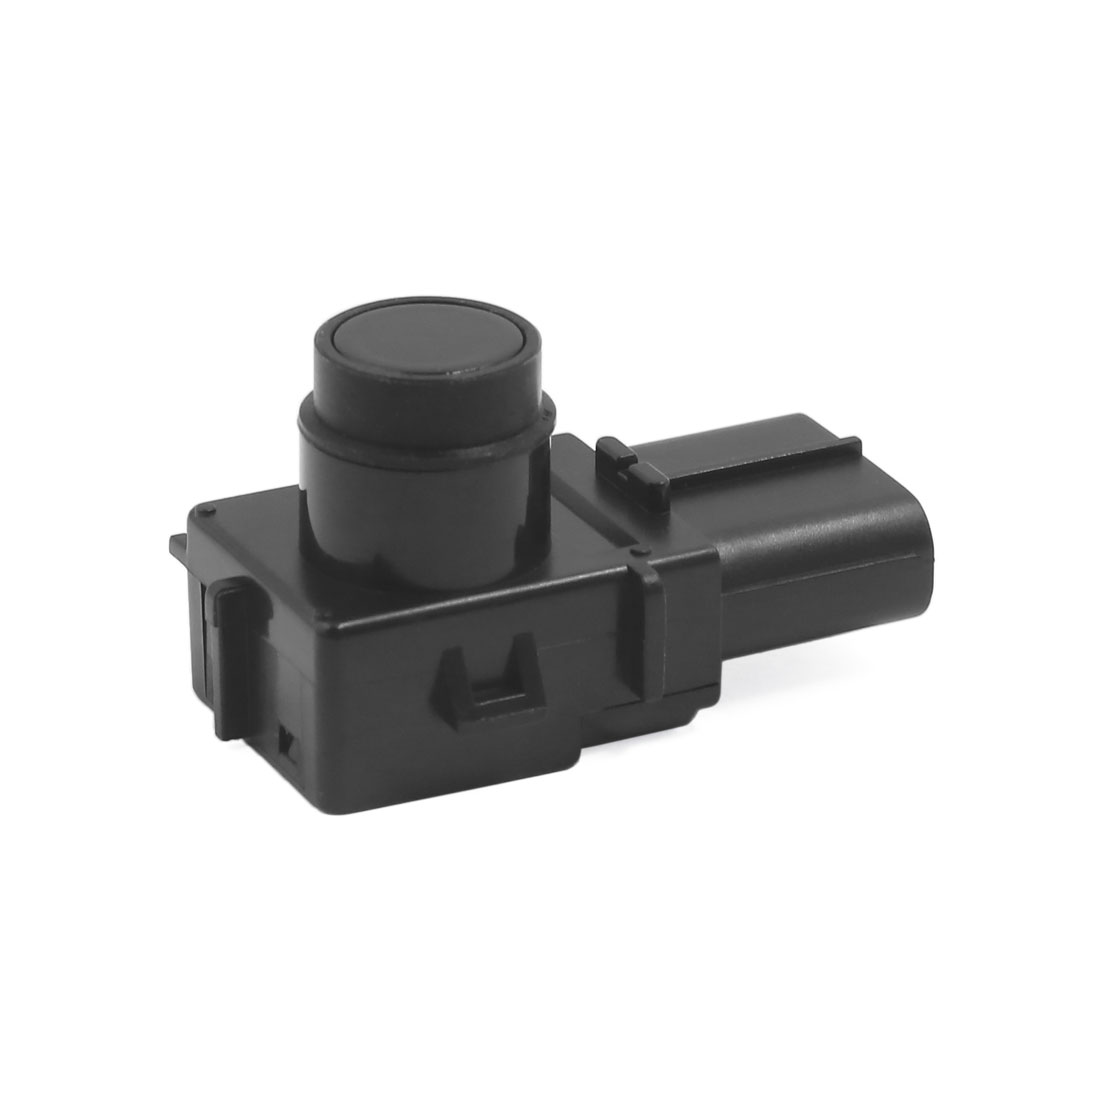 NEW Black 6 Pins Reverse Parking Sensor 89341-50060-C1 for LEXUS LS LS460 08 09 10 11 12